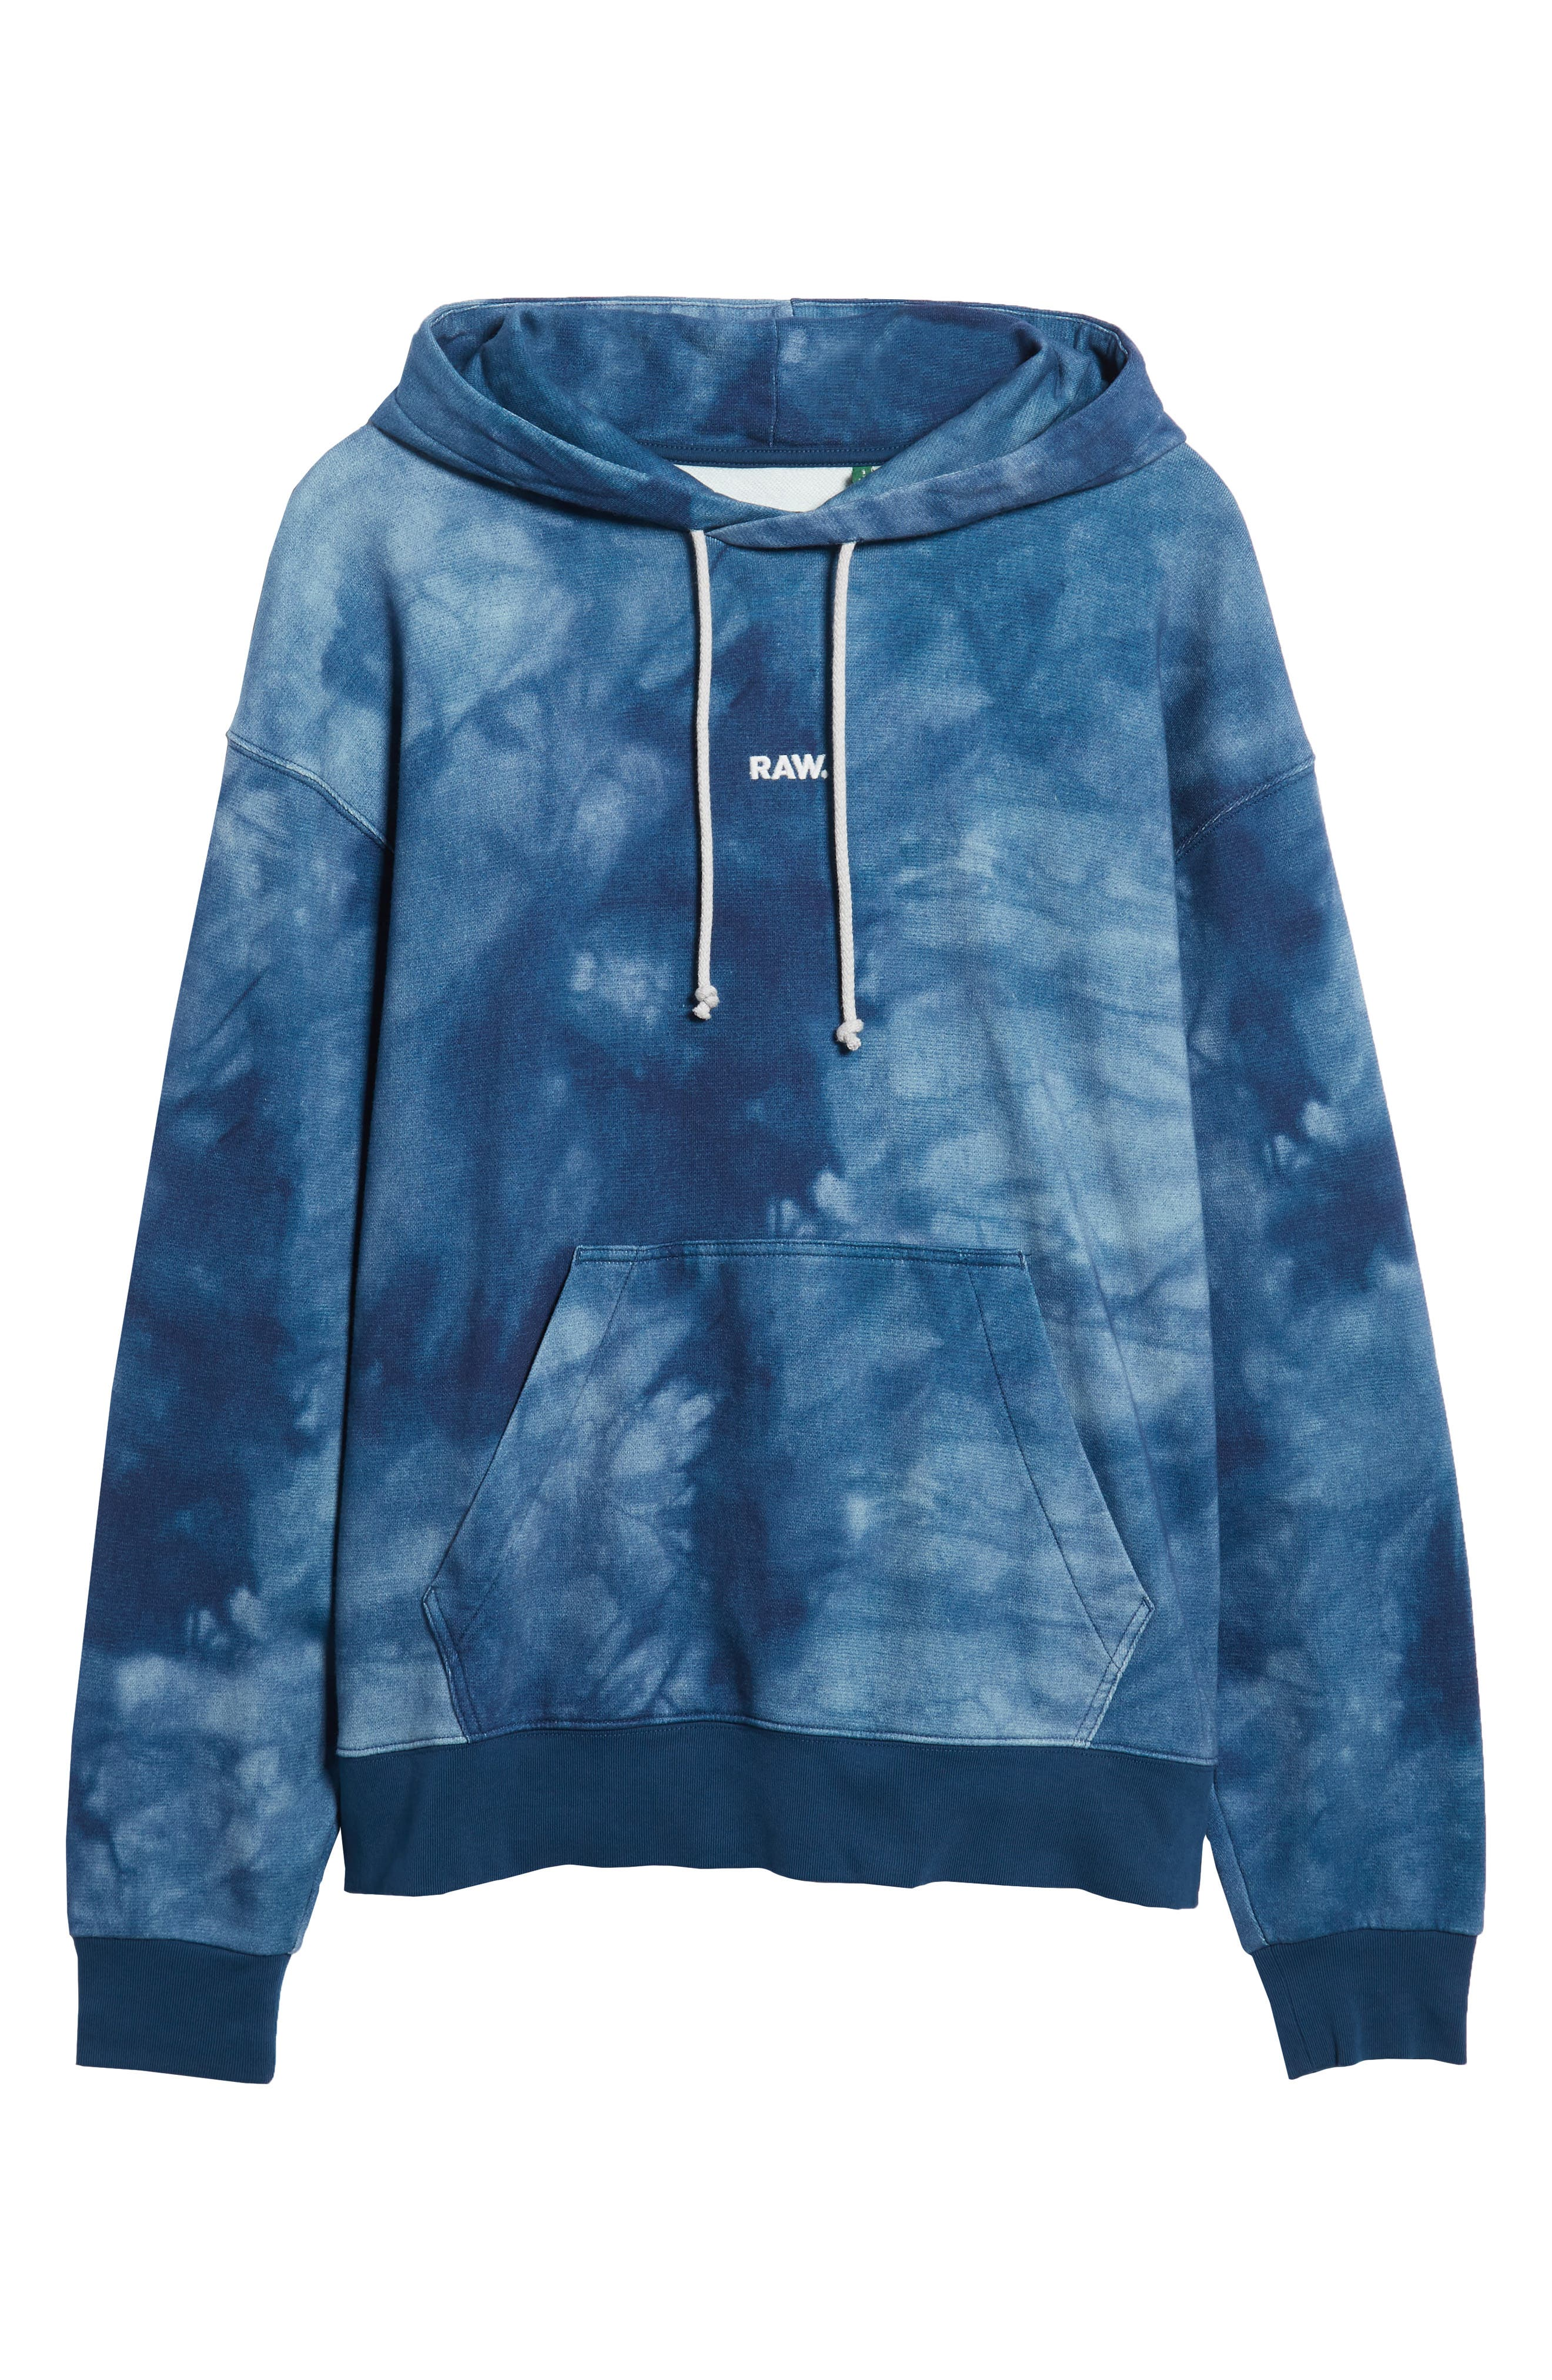 Cryrer Waterfall Hooded Sweatshirt,                             Alternate thumbnail 6, color,                             TEAL BLUE